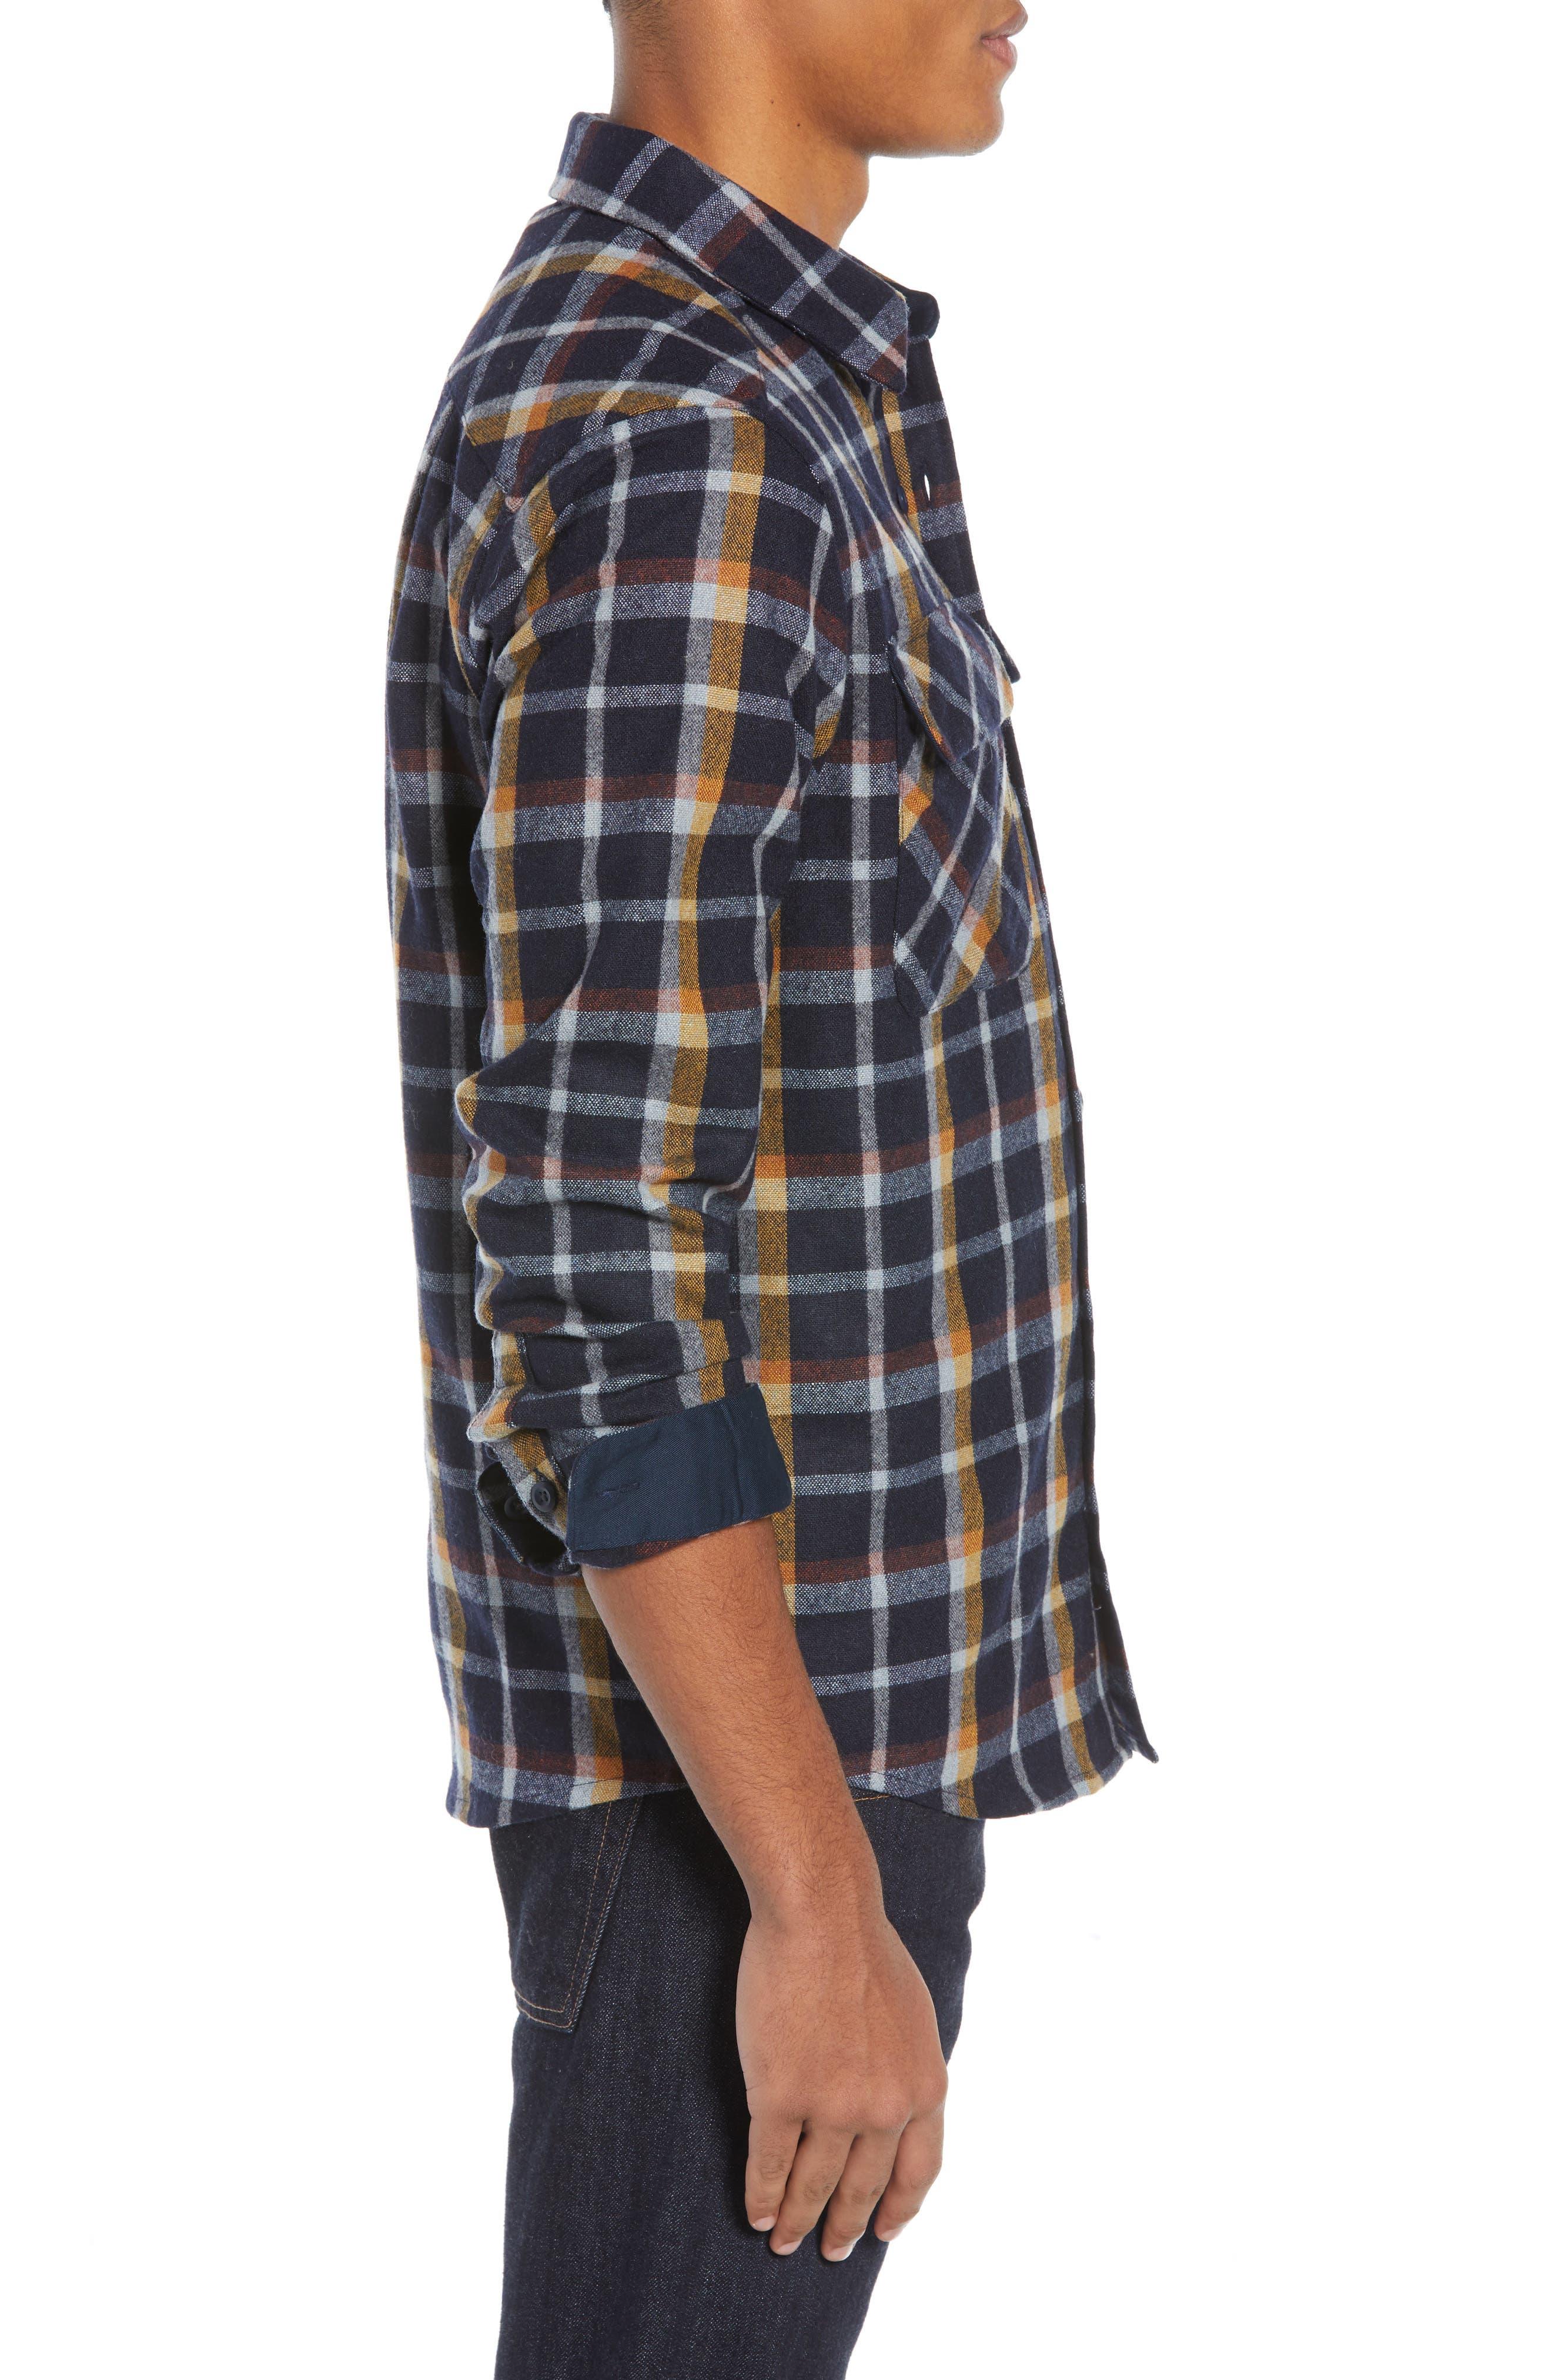 Recycled Wool Blend Shirt,                             Alternate thumbnail 4, color,                             REBEL PLAID/ NAVY BLUE